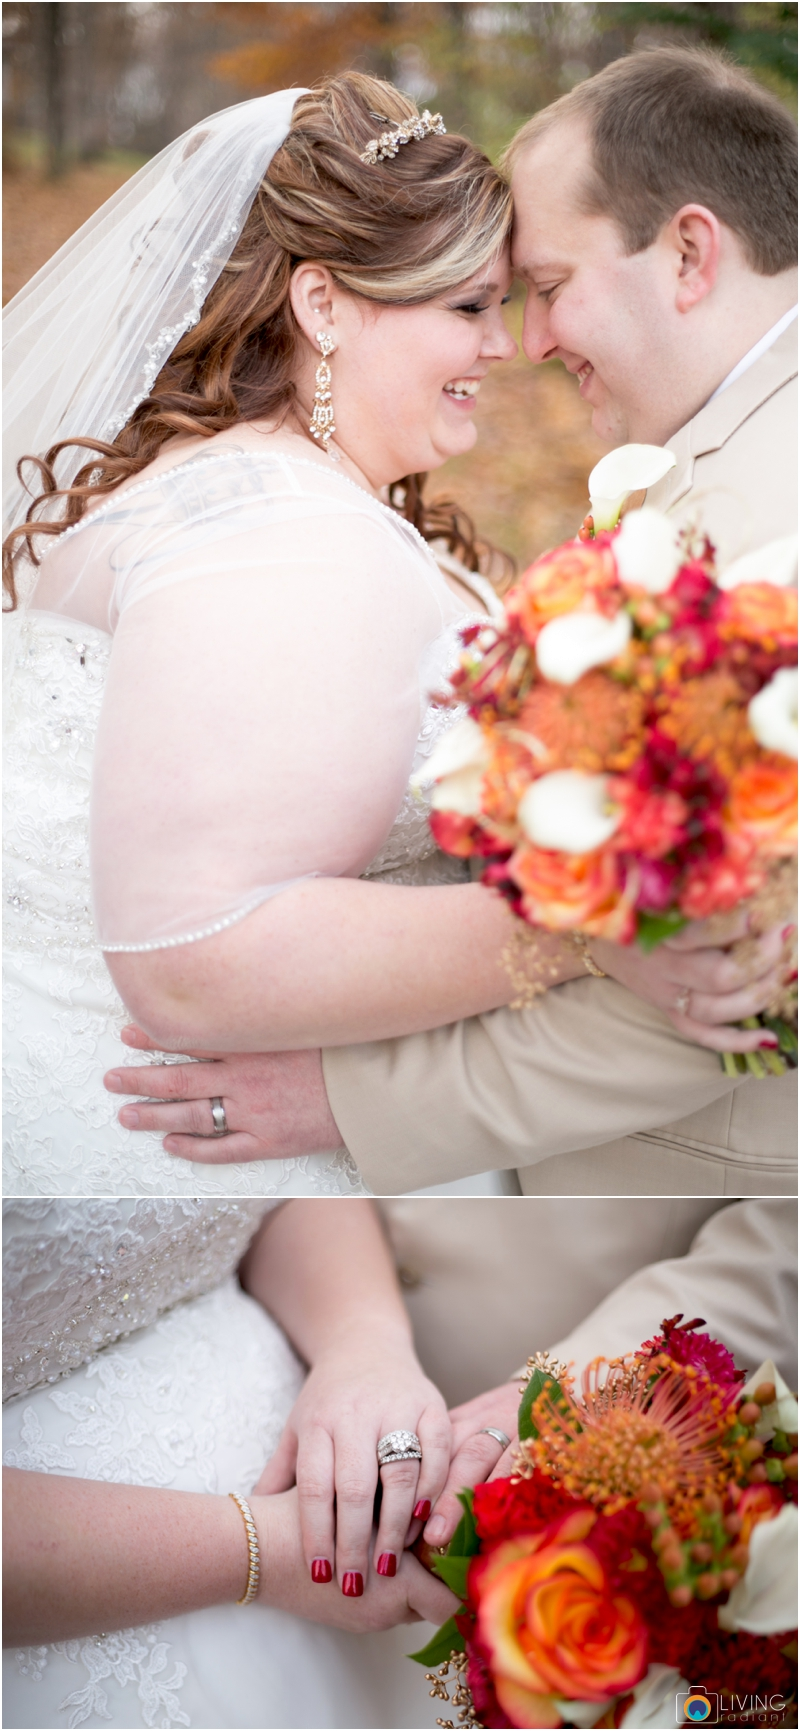 Kevin-Cassie-Pennsylvania-Littlestown-Chapel-Wedding-Living-Radiant-Photography_0025.jpg